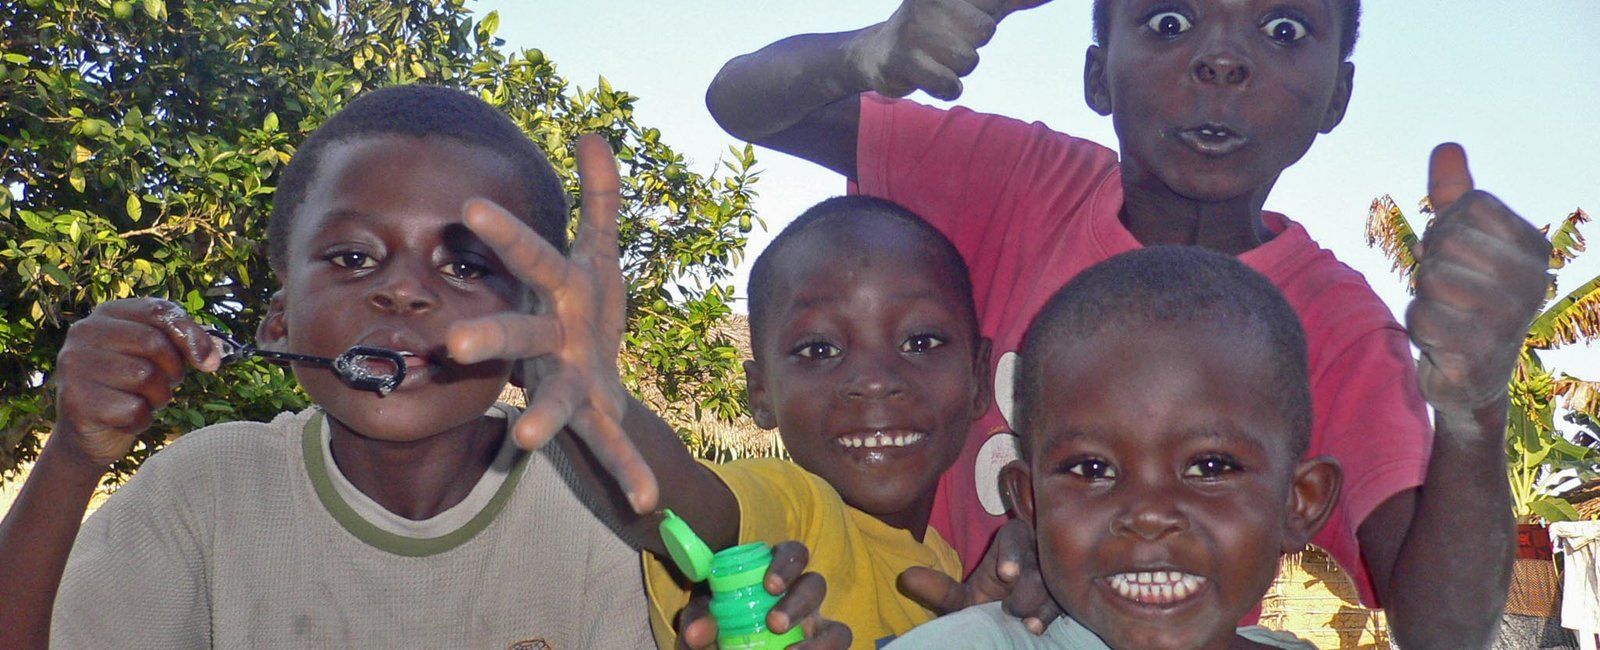 Alex Ward - Medical Electives in Ghana Takoradi